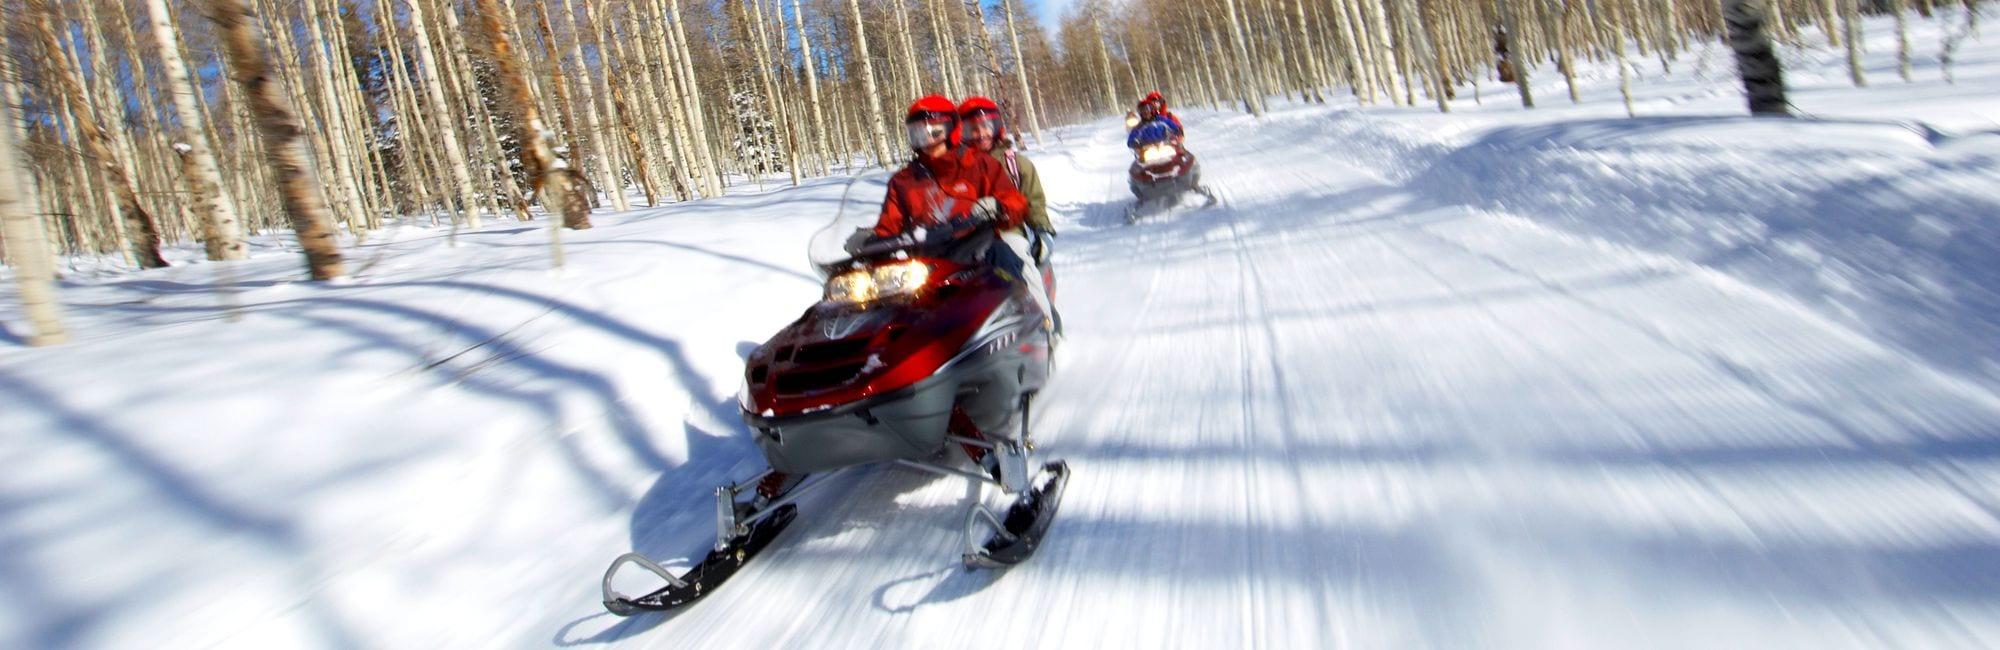 Couples Racing on Snowmobiles